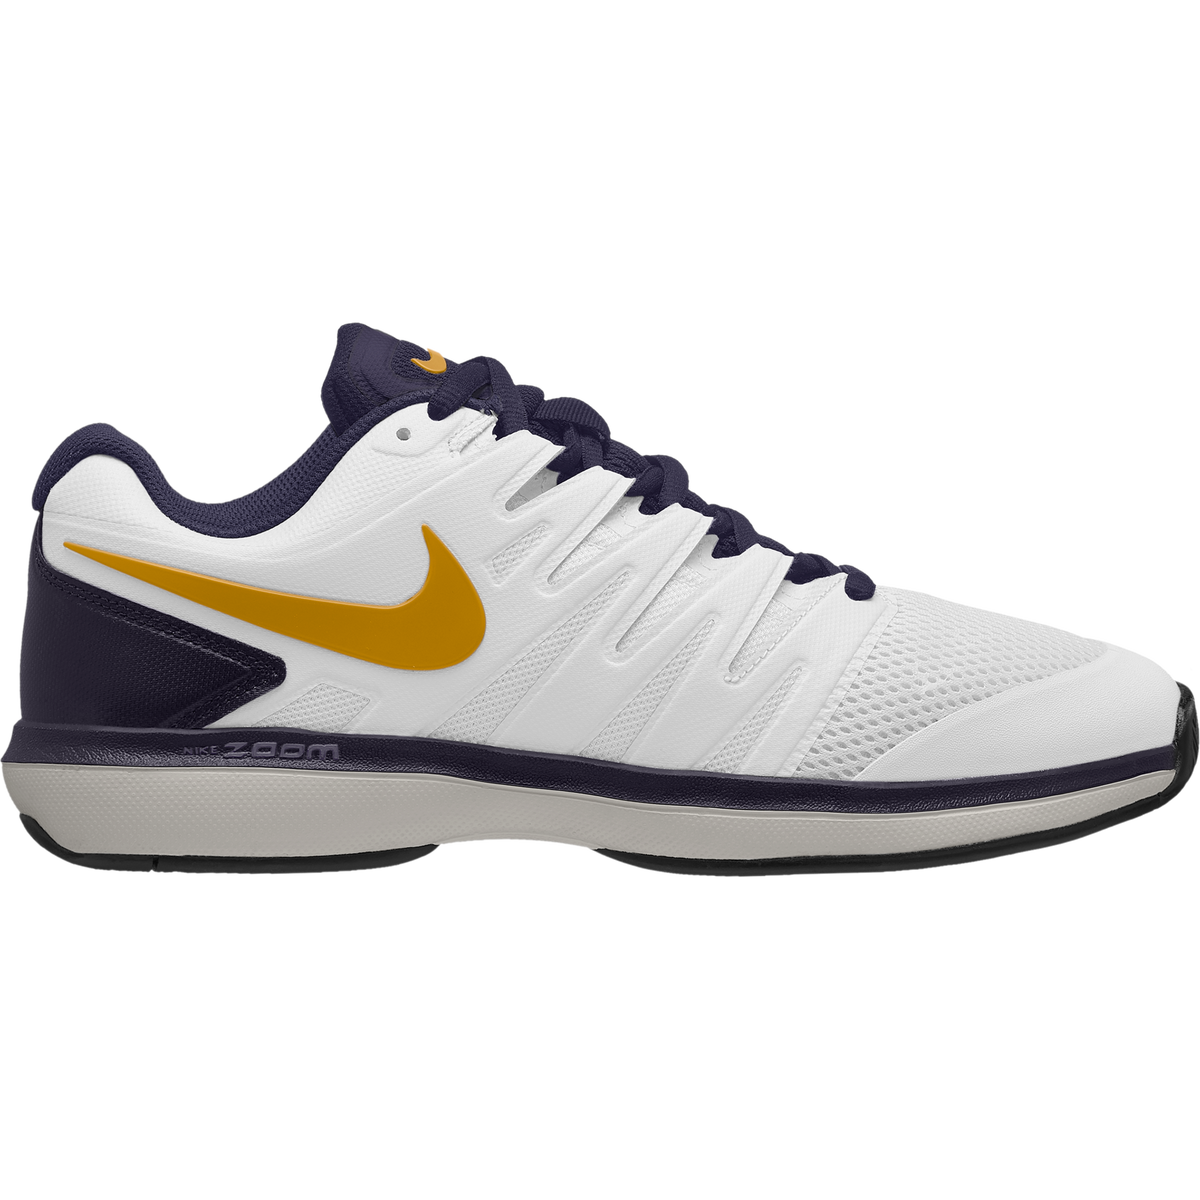 e53a867f23f Nike Air Zoom Prestige Men s Tennis Shoe - White Navy Orange